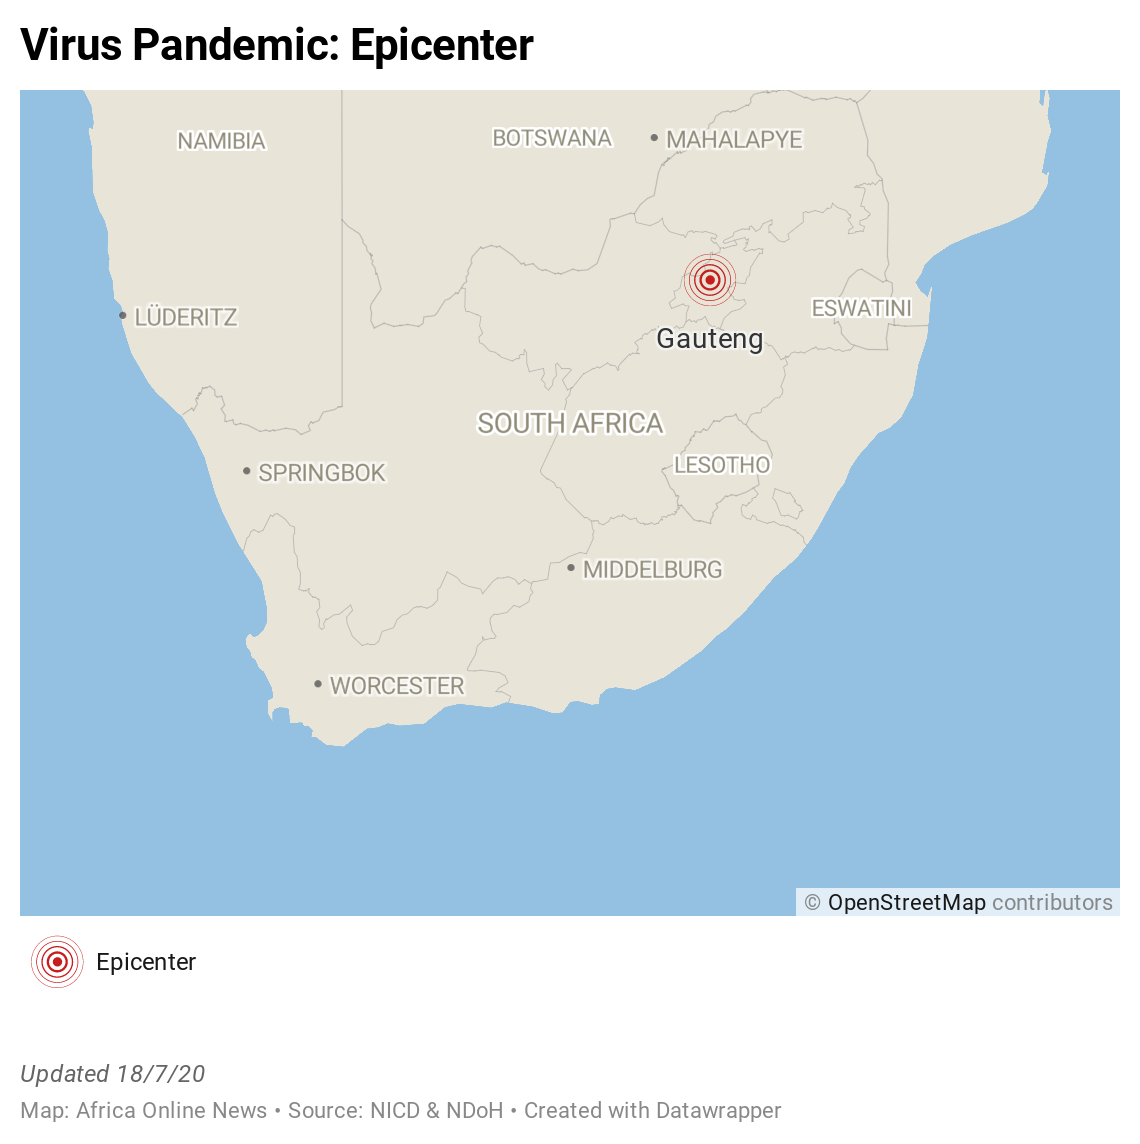 umEIH-virus-pandemic-epicenter